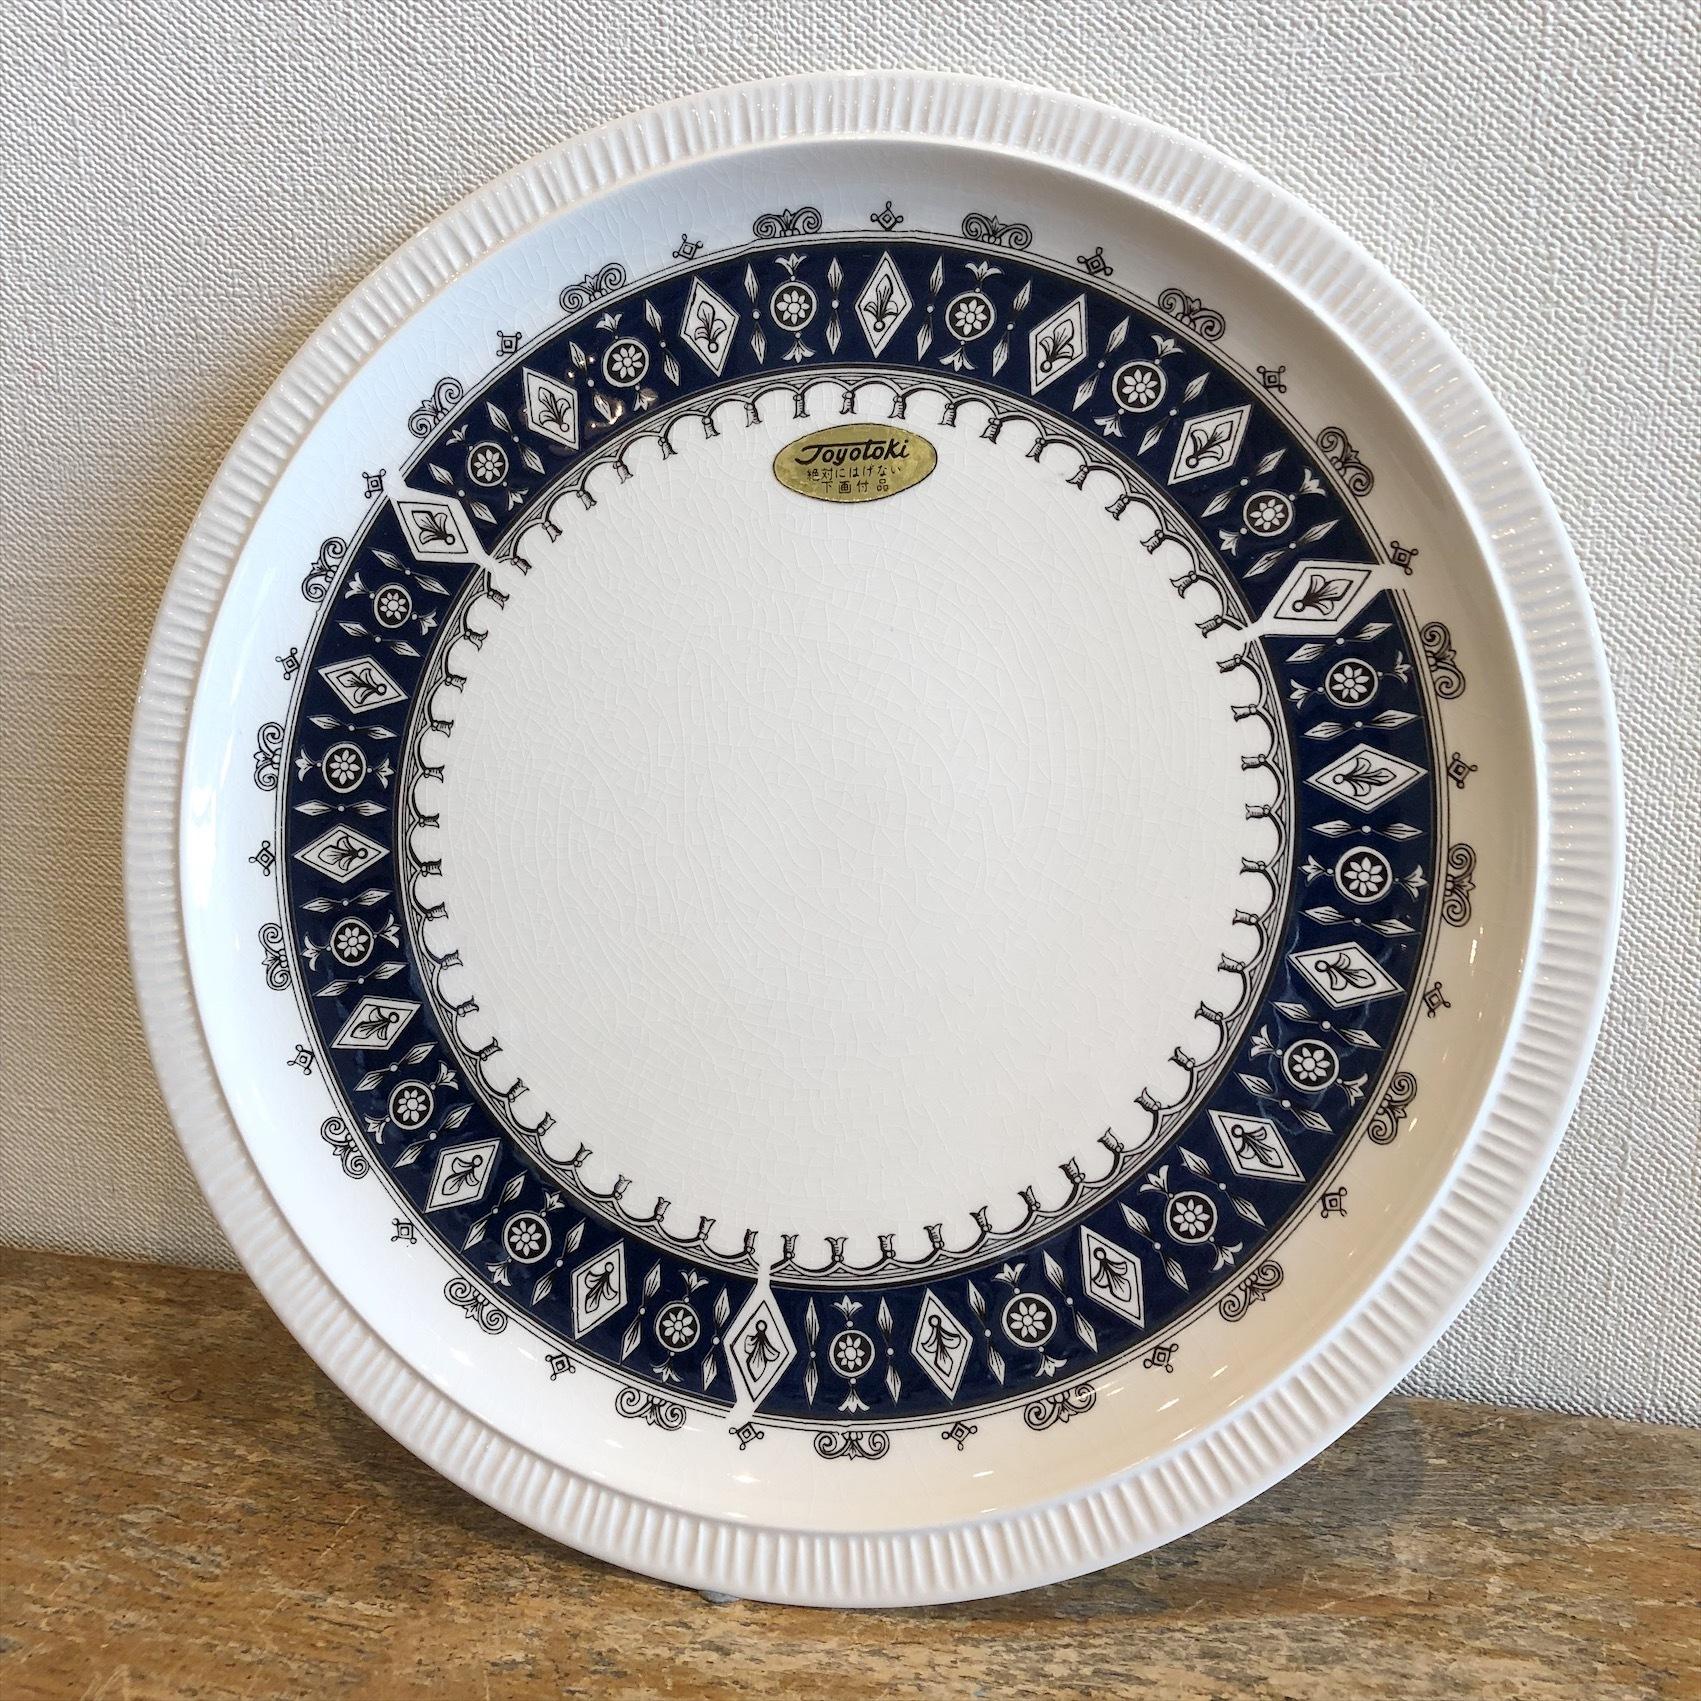 Toyotoki 絶対にはげない皿